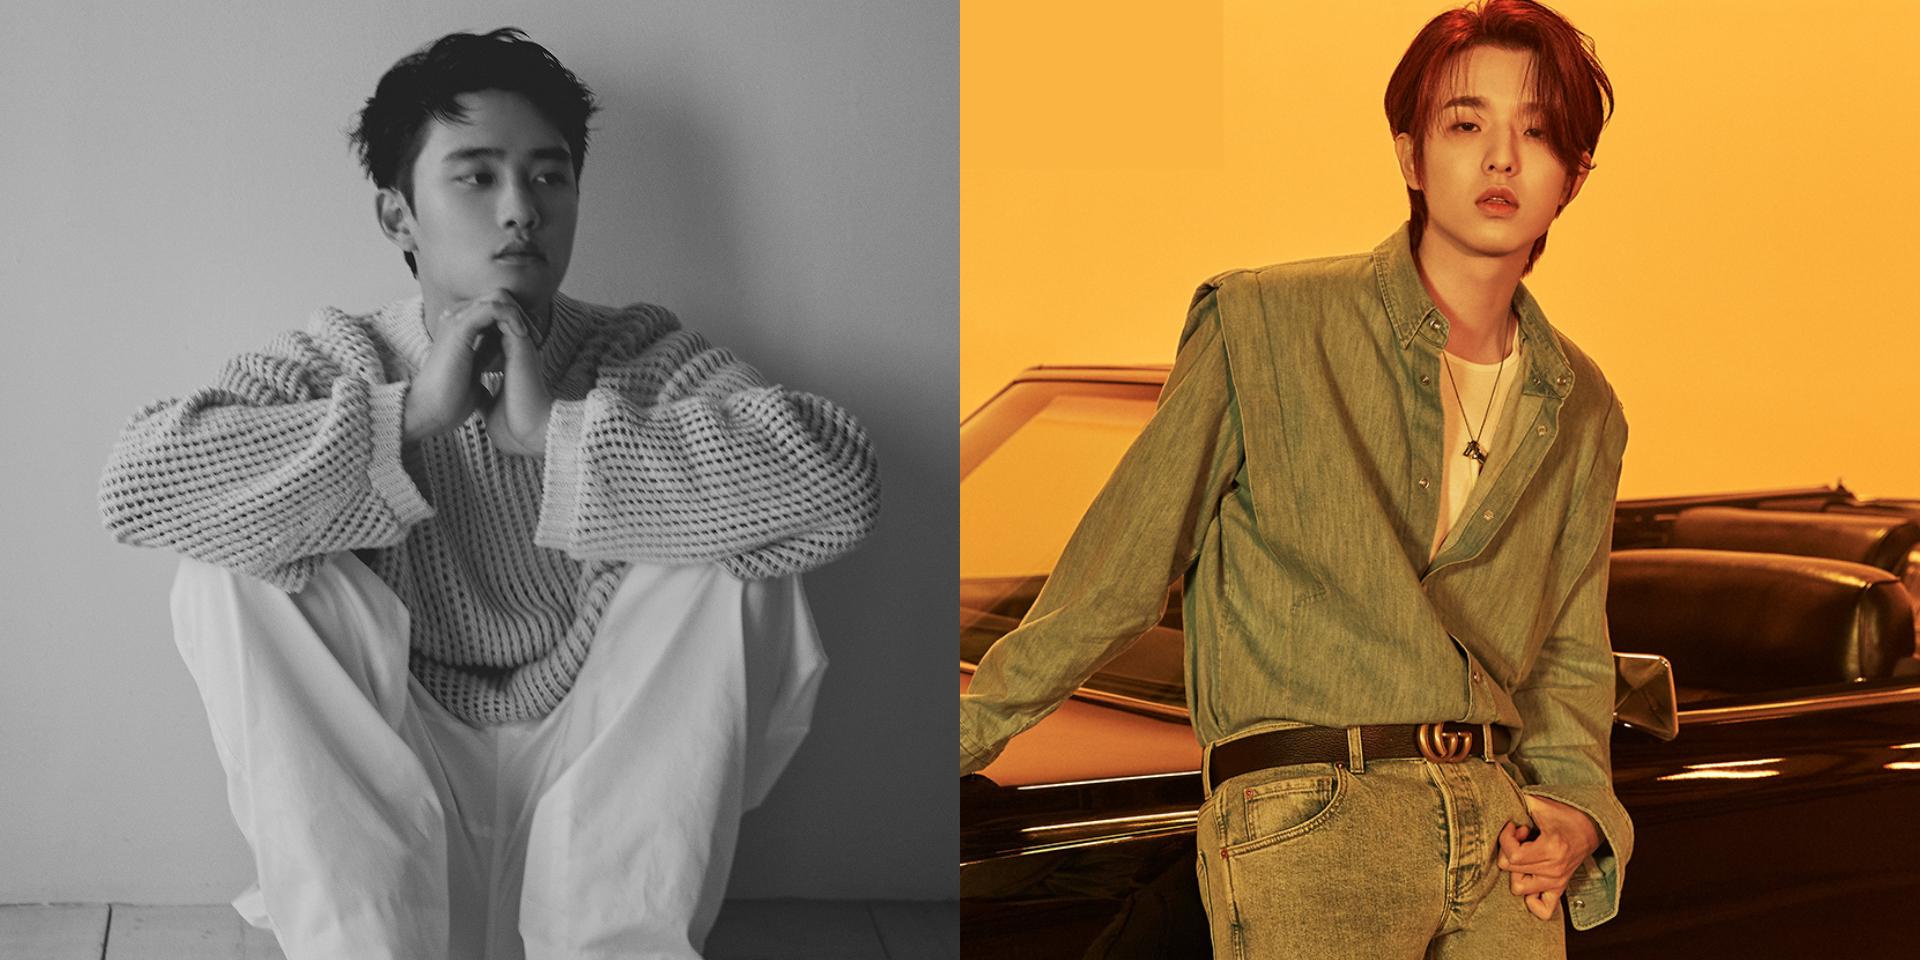 EXO's D.O. taps DAY6's Jae, danke, Andreas Ringblom, and more for solo debut mini-album, 'Empathy'